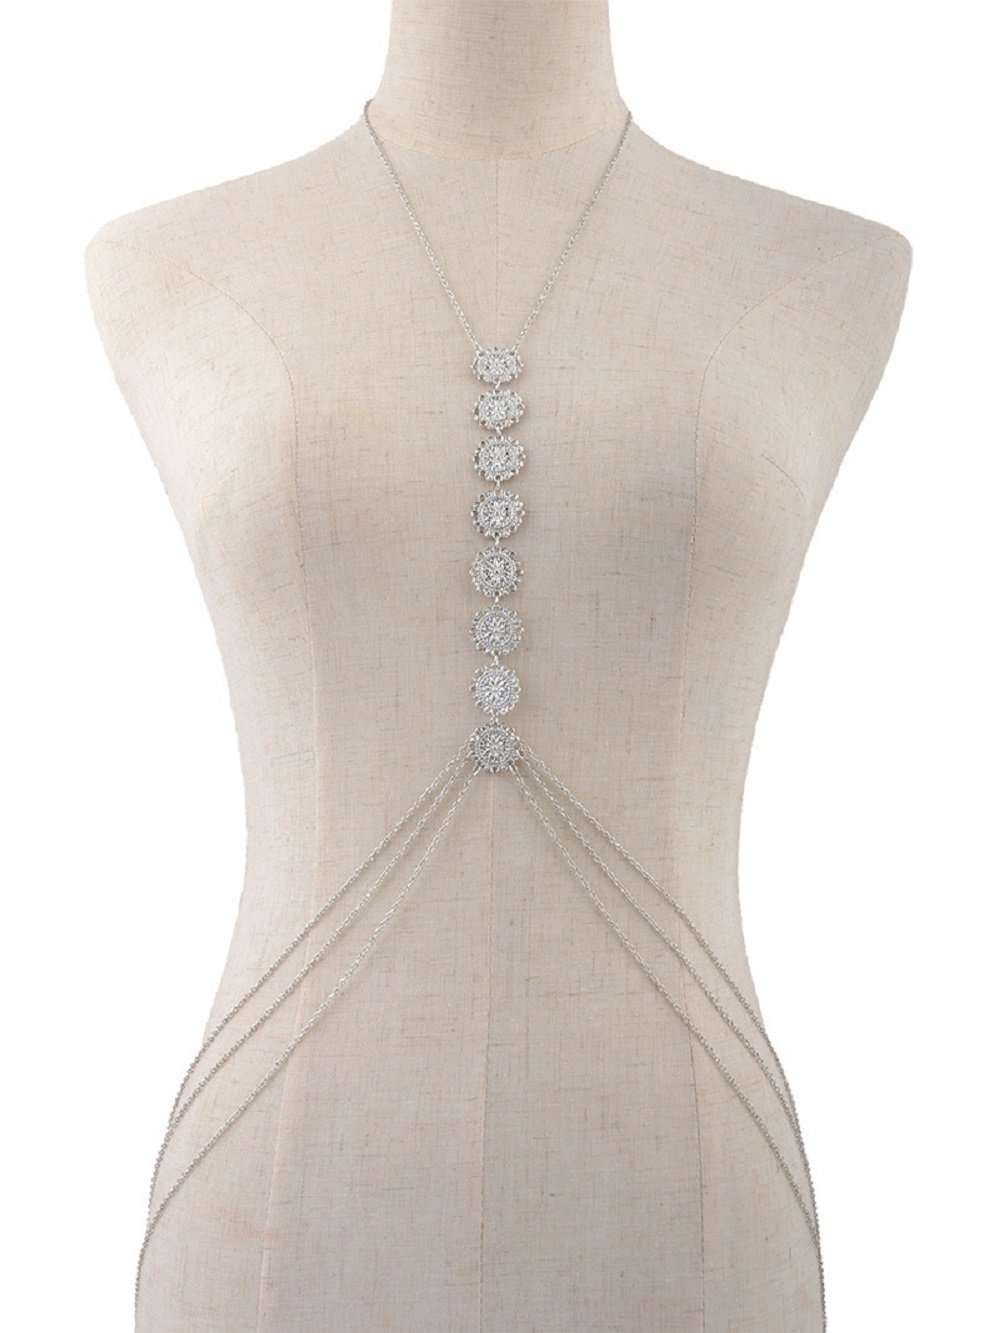 JeVenisSexy HarnessBikiniBralette BodyChainsCrossover Harness Waist Belly Body Chain Necklace (Silver) by JeVenis (Image #6)